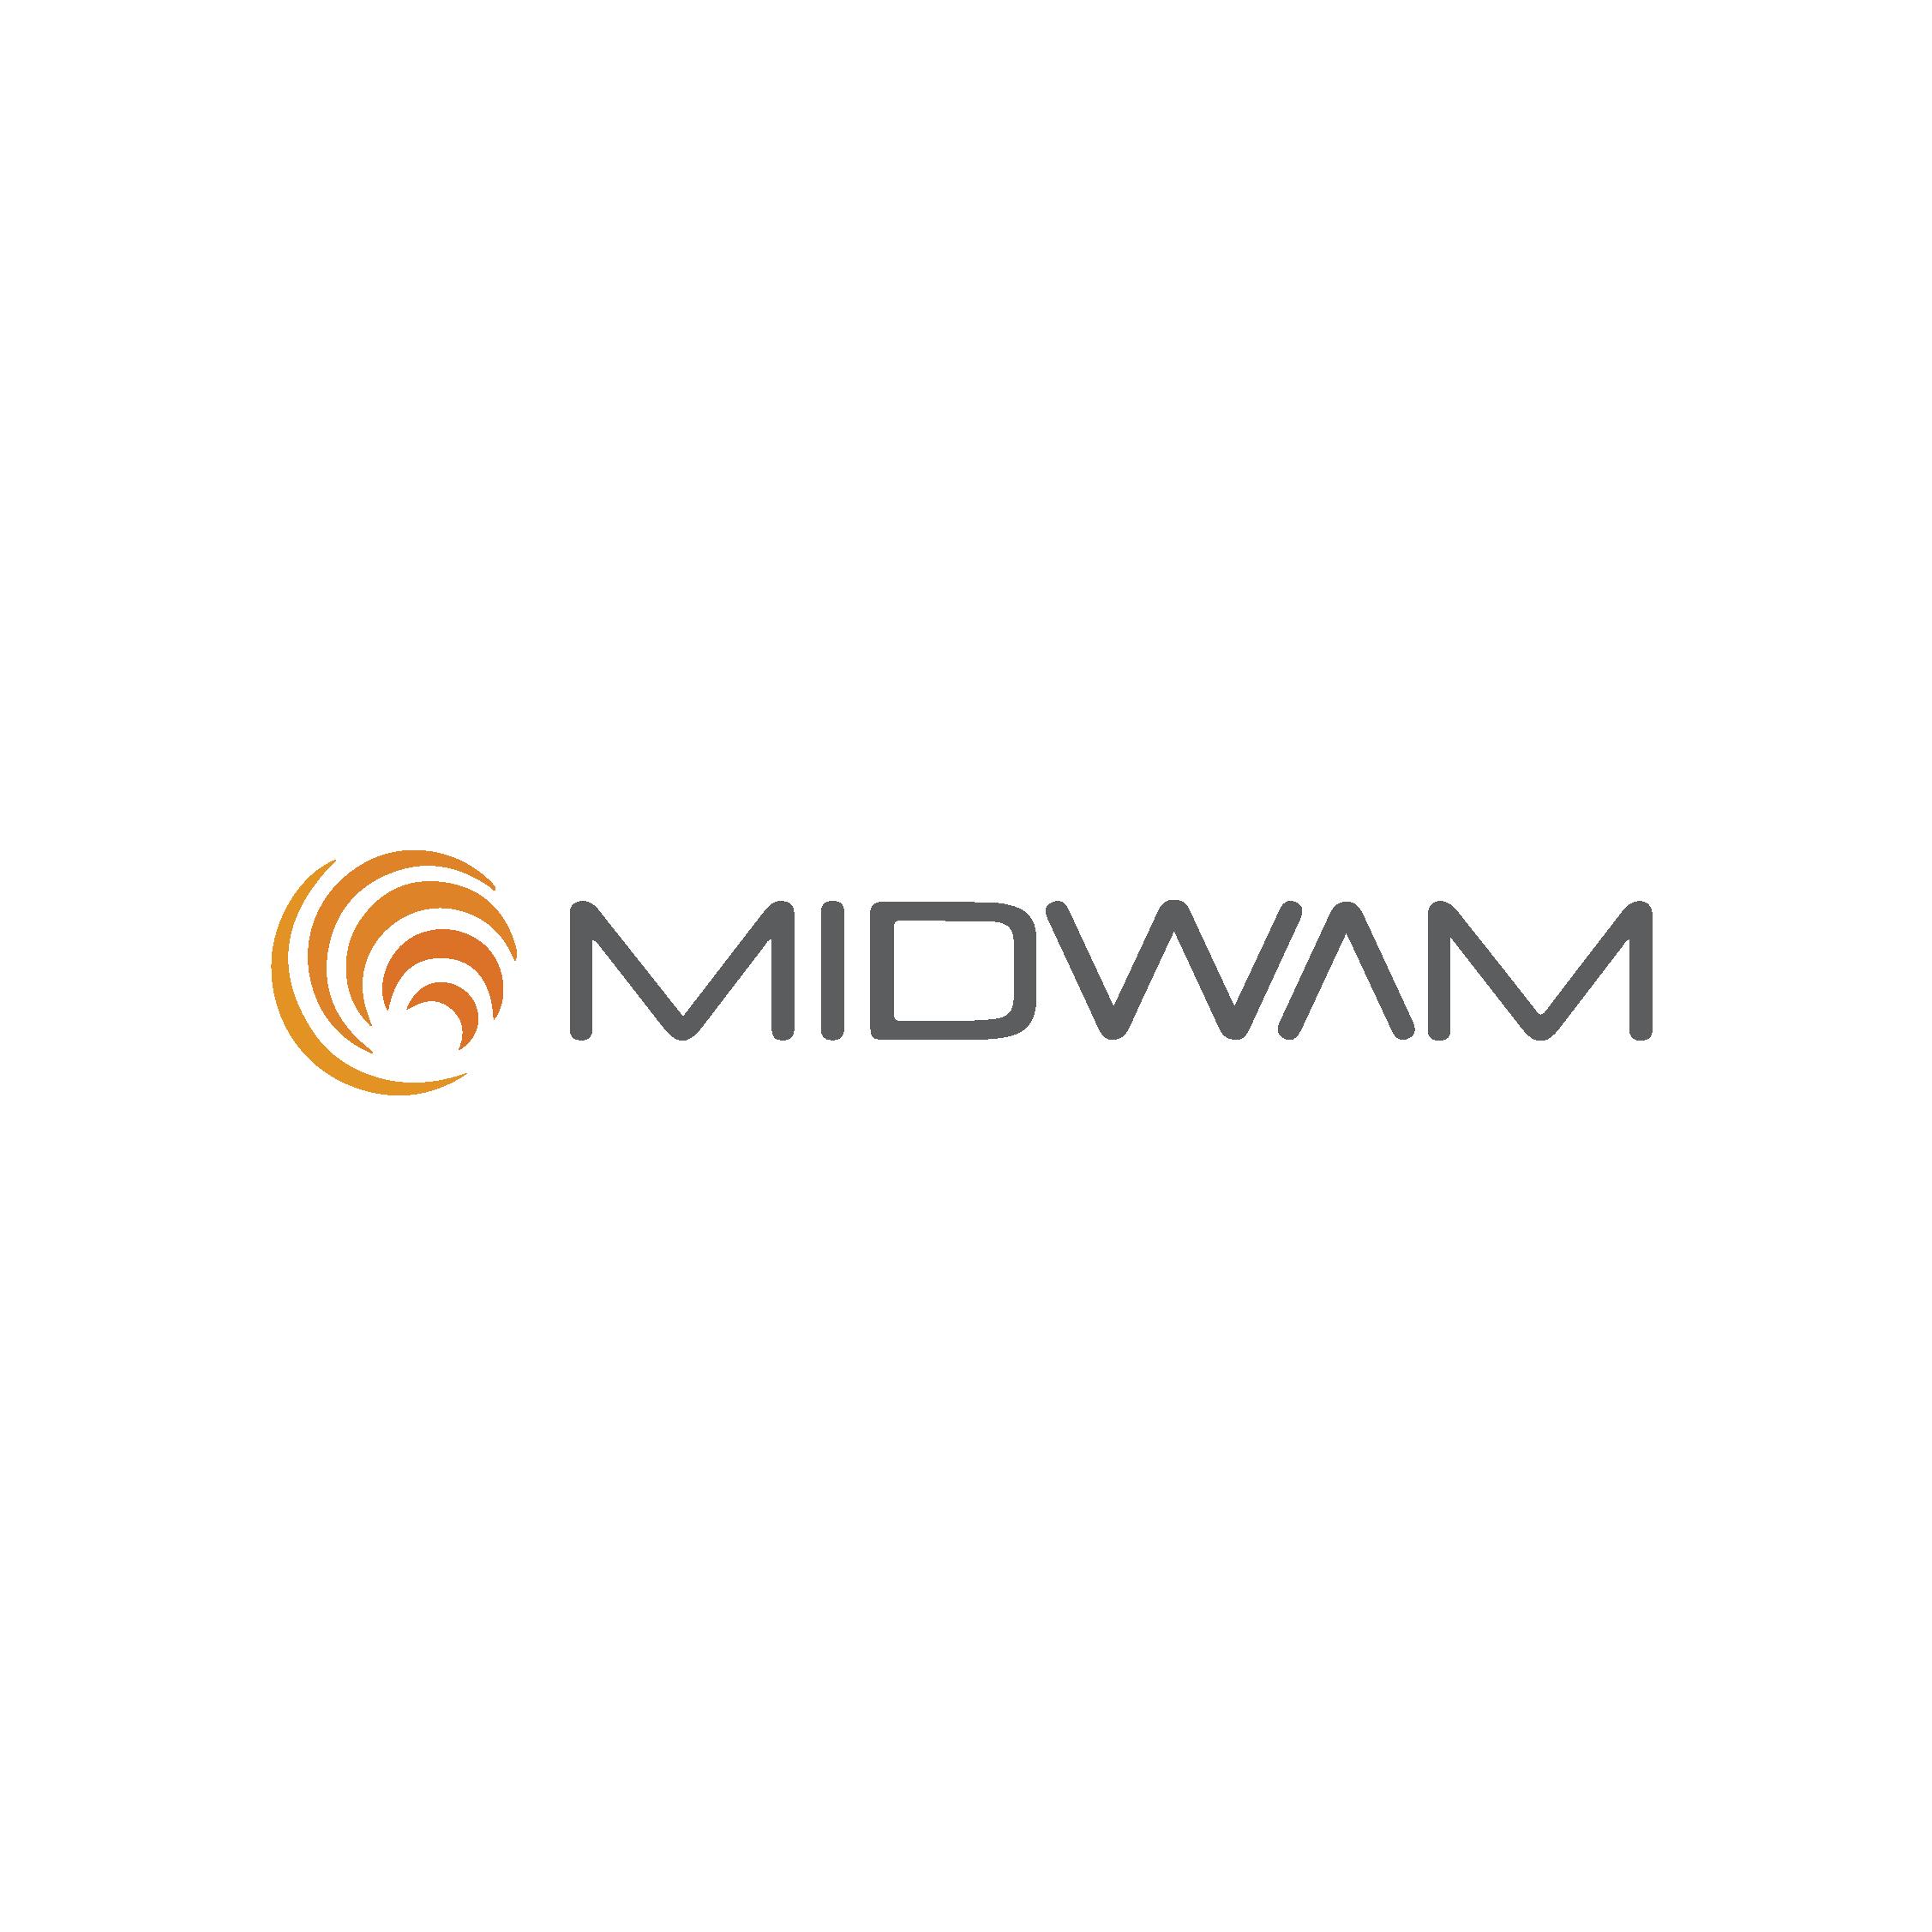 Midwam